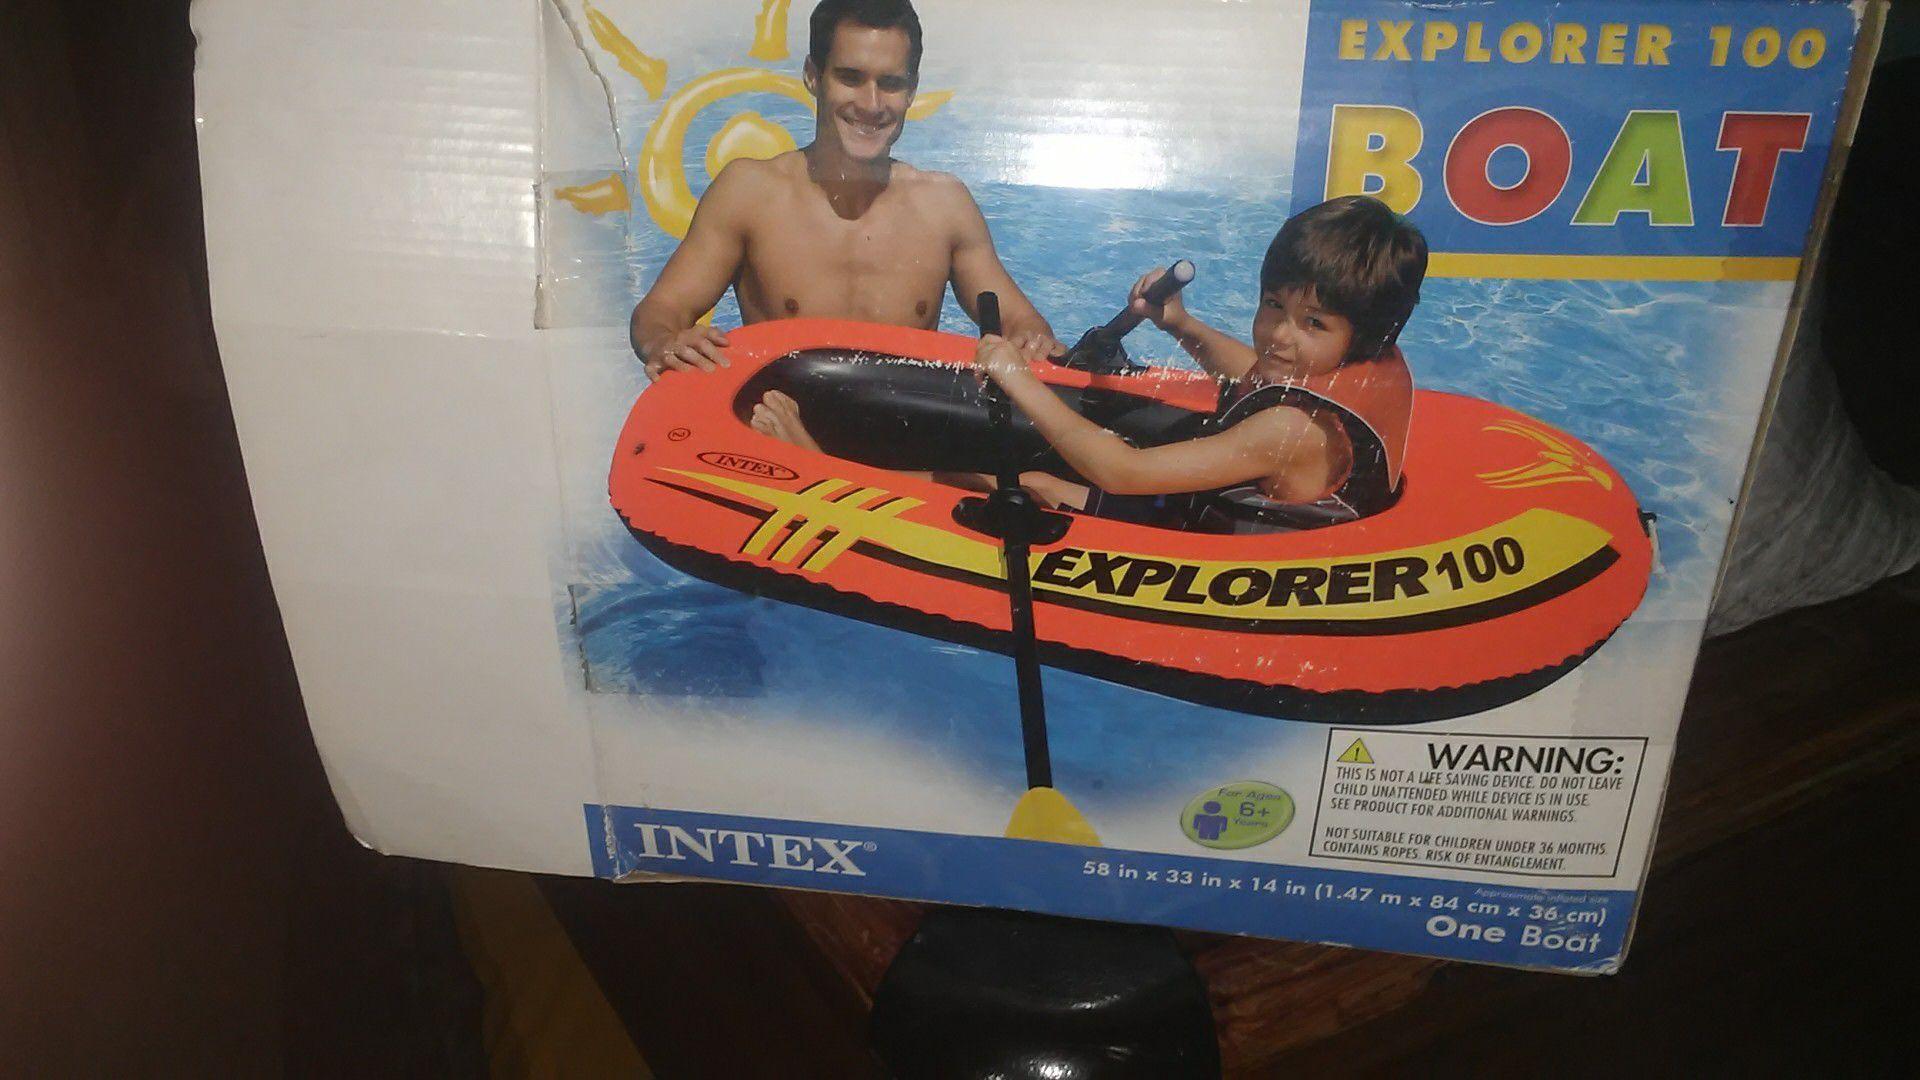 One explorer 100 boat